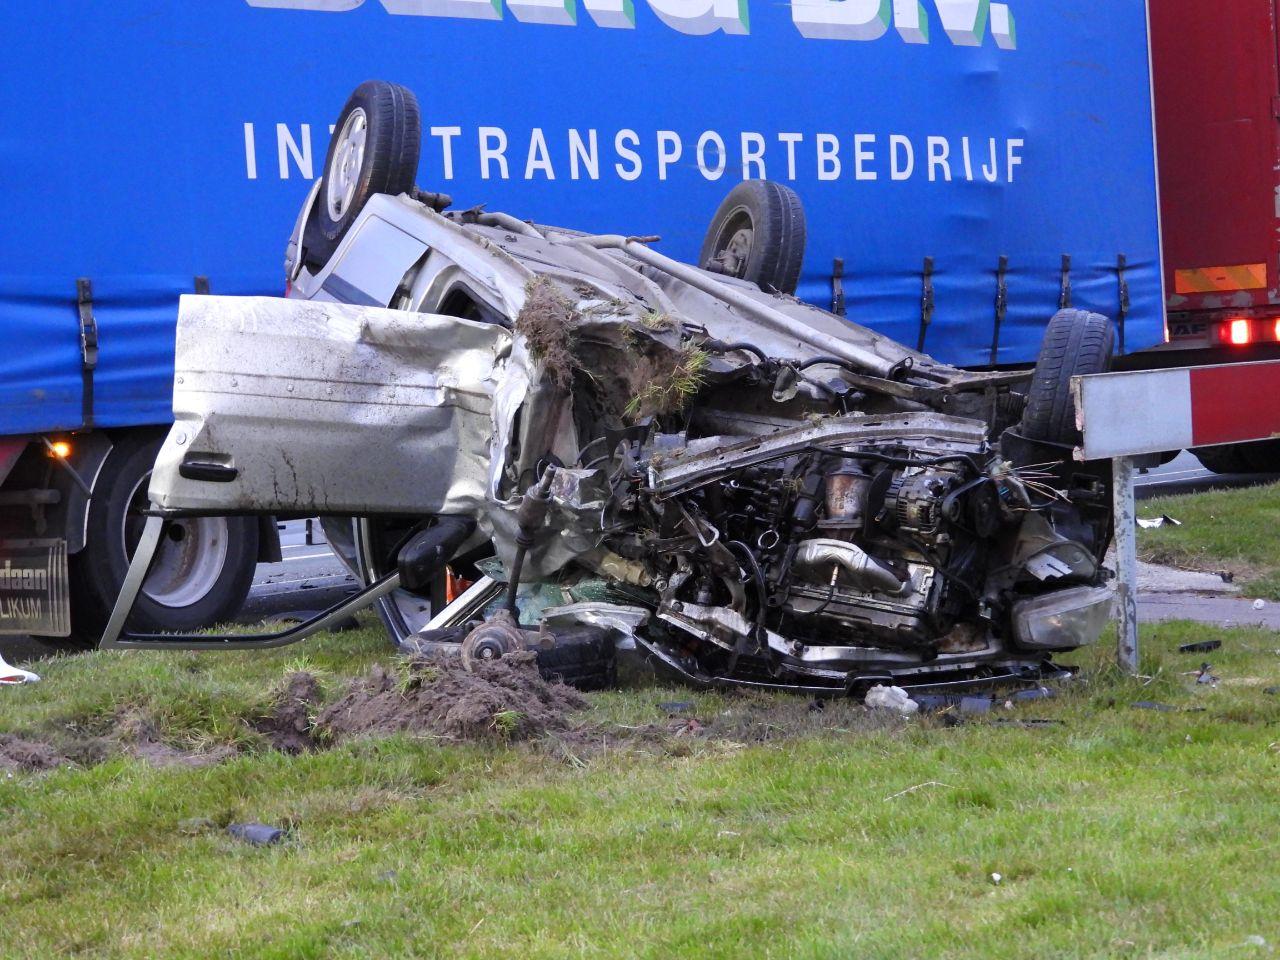 bestuurder raakt ernstige gewond na botsing met vrachtwagen in Hallum